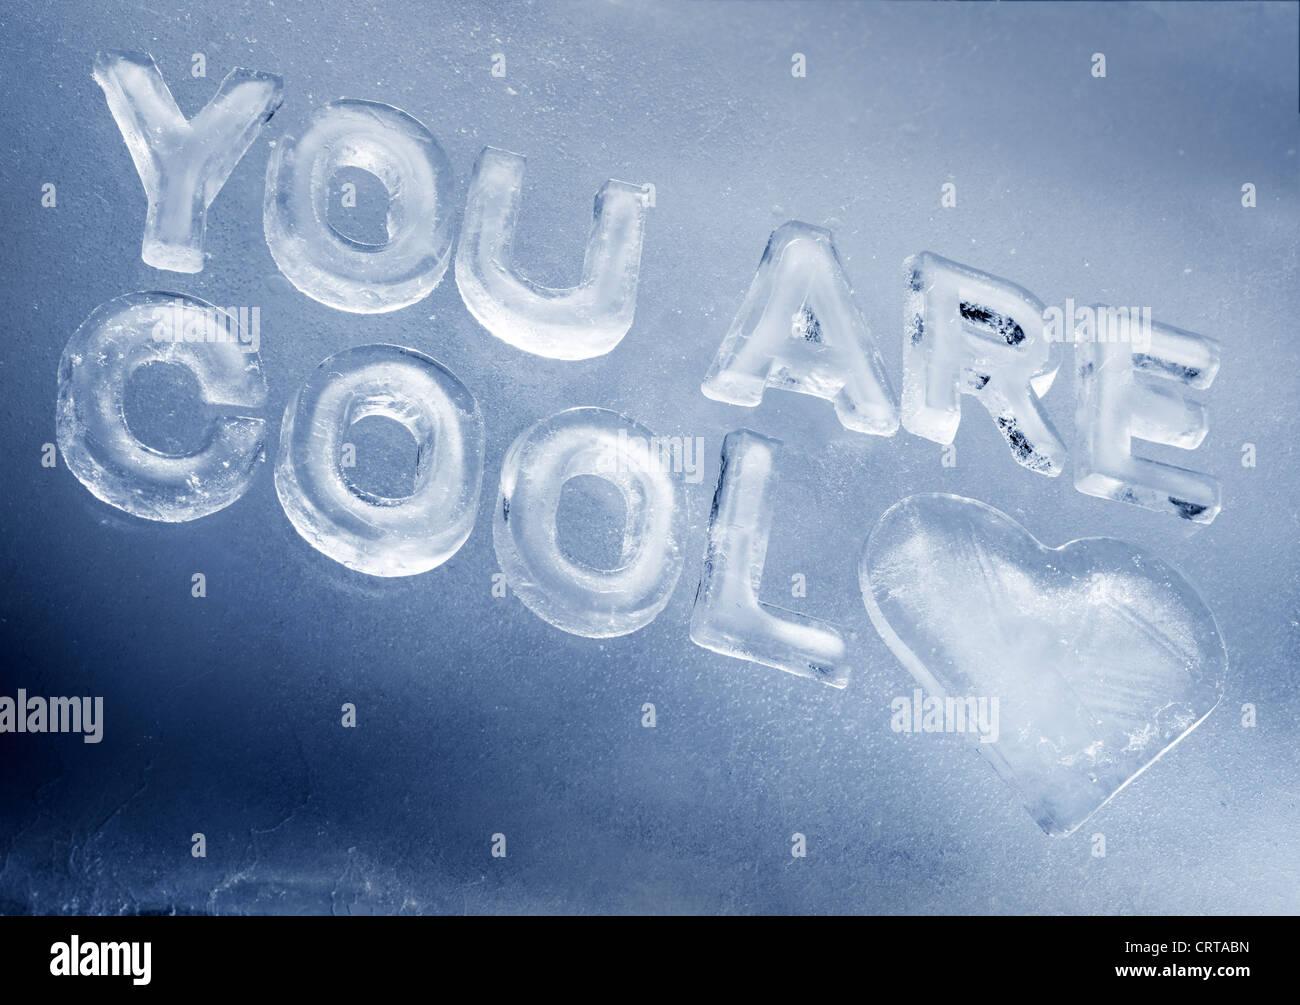 'Cool' está escrito con letras de hielo real. Imagen De Stock